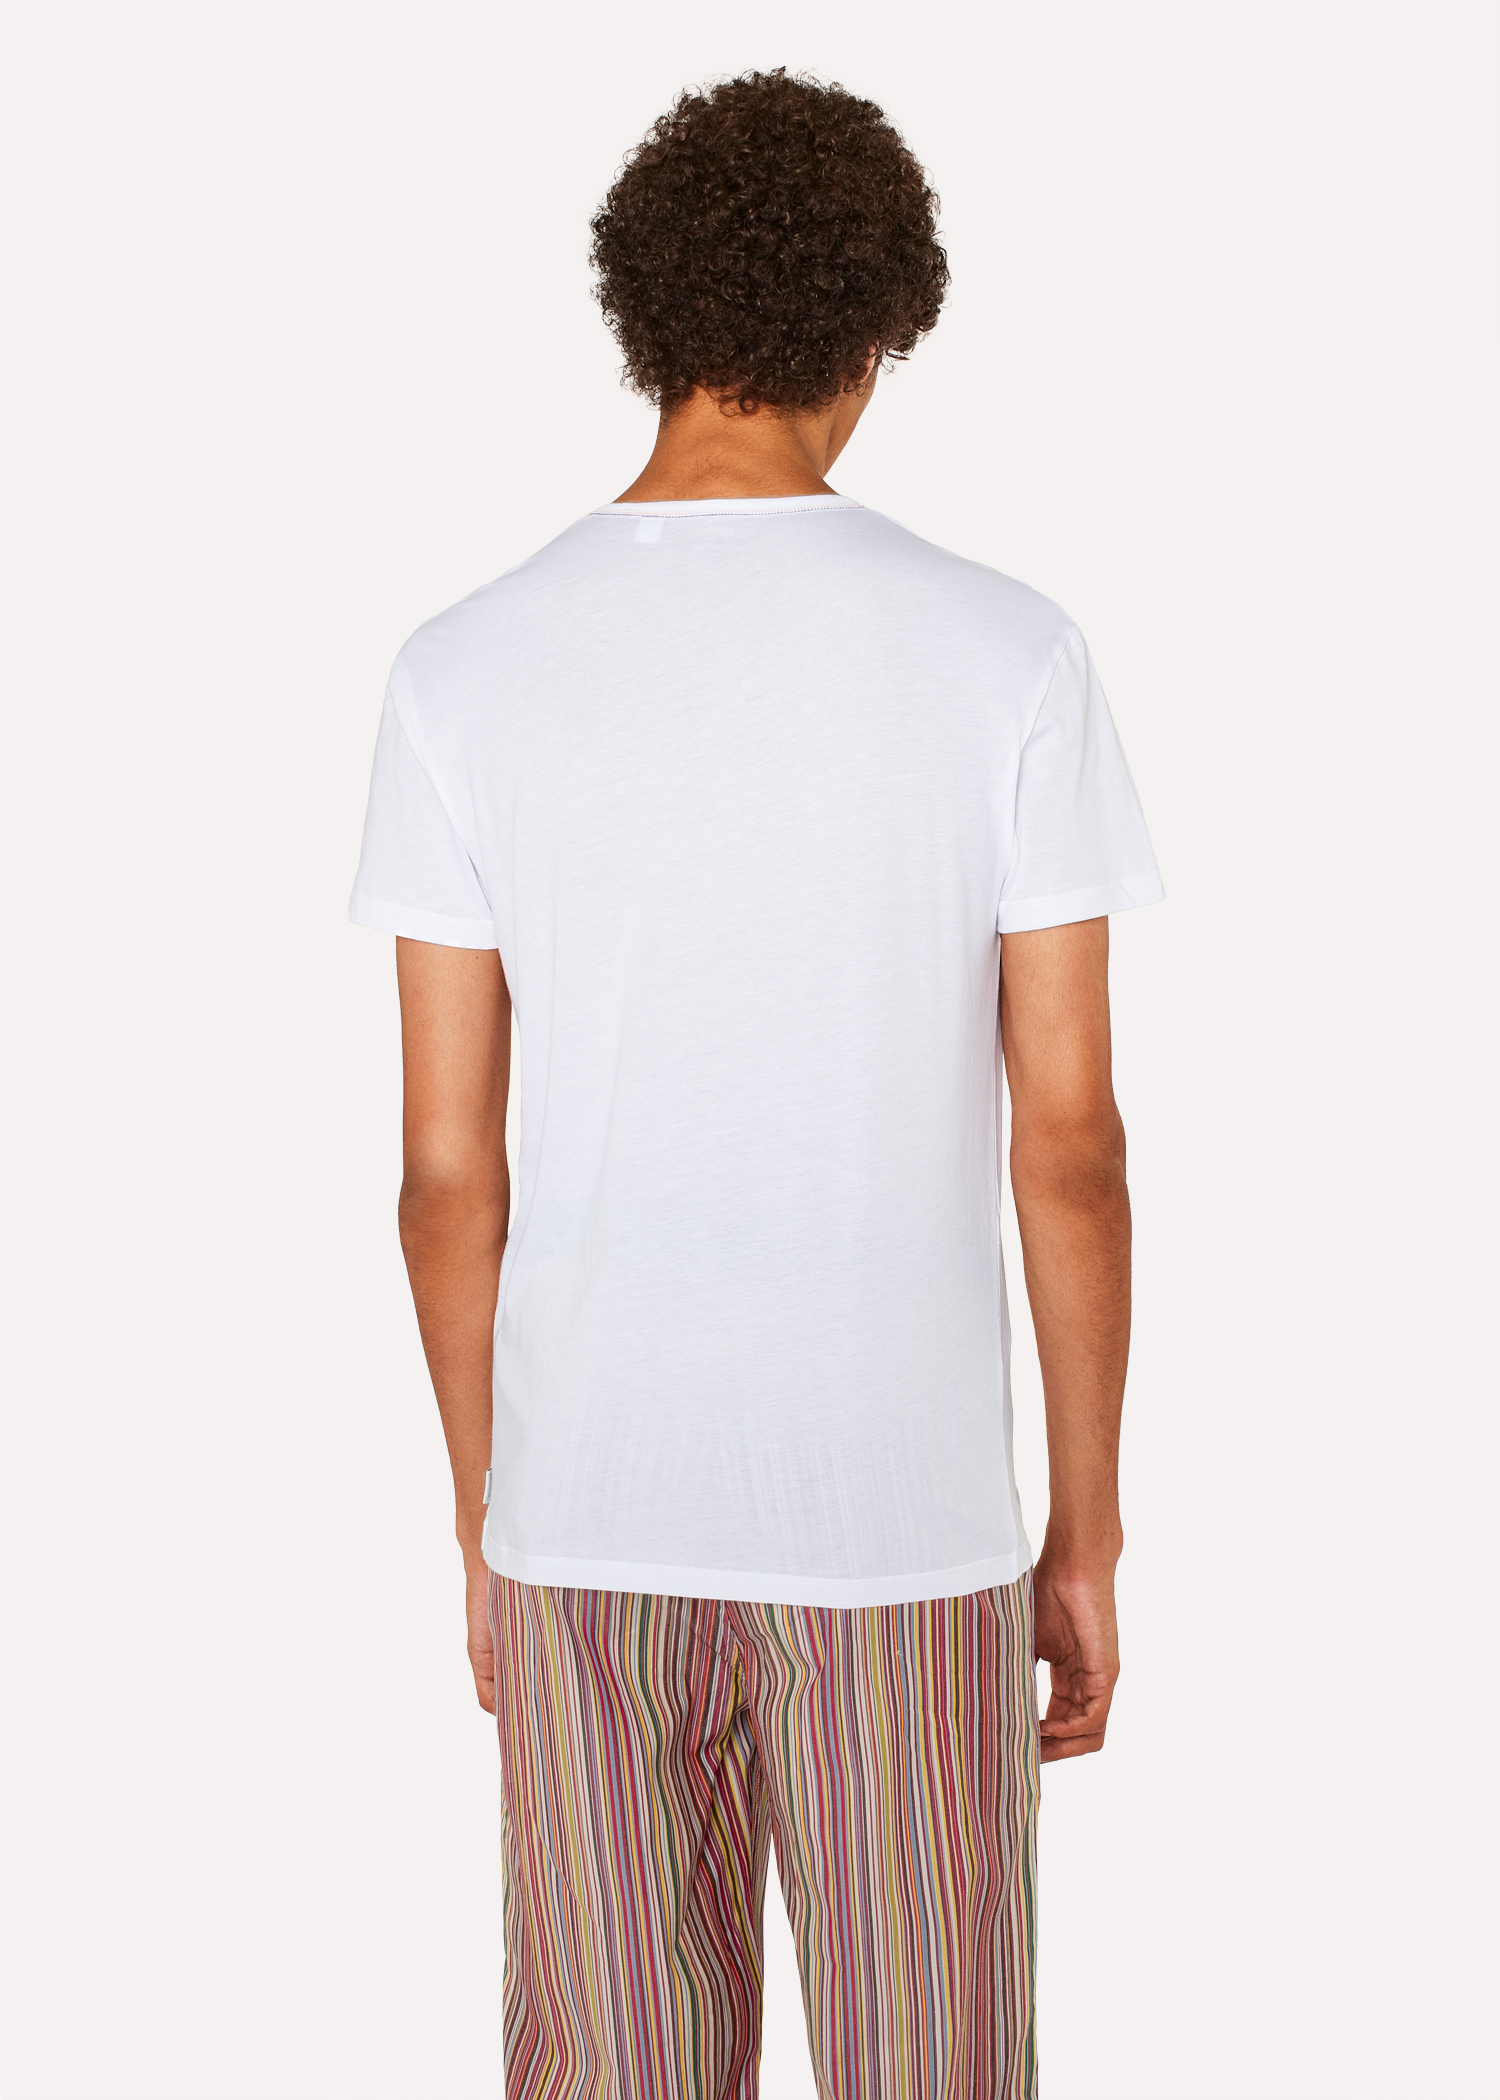 974ea013 Pima Cotton T Shirts Mens - Nils Stucki Kieferorthopäde